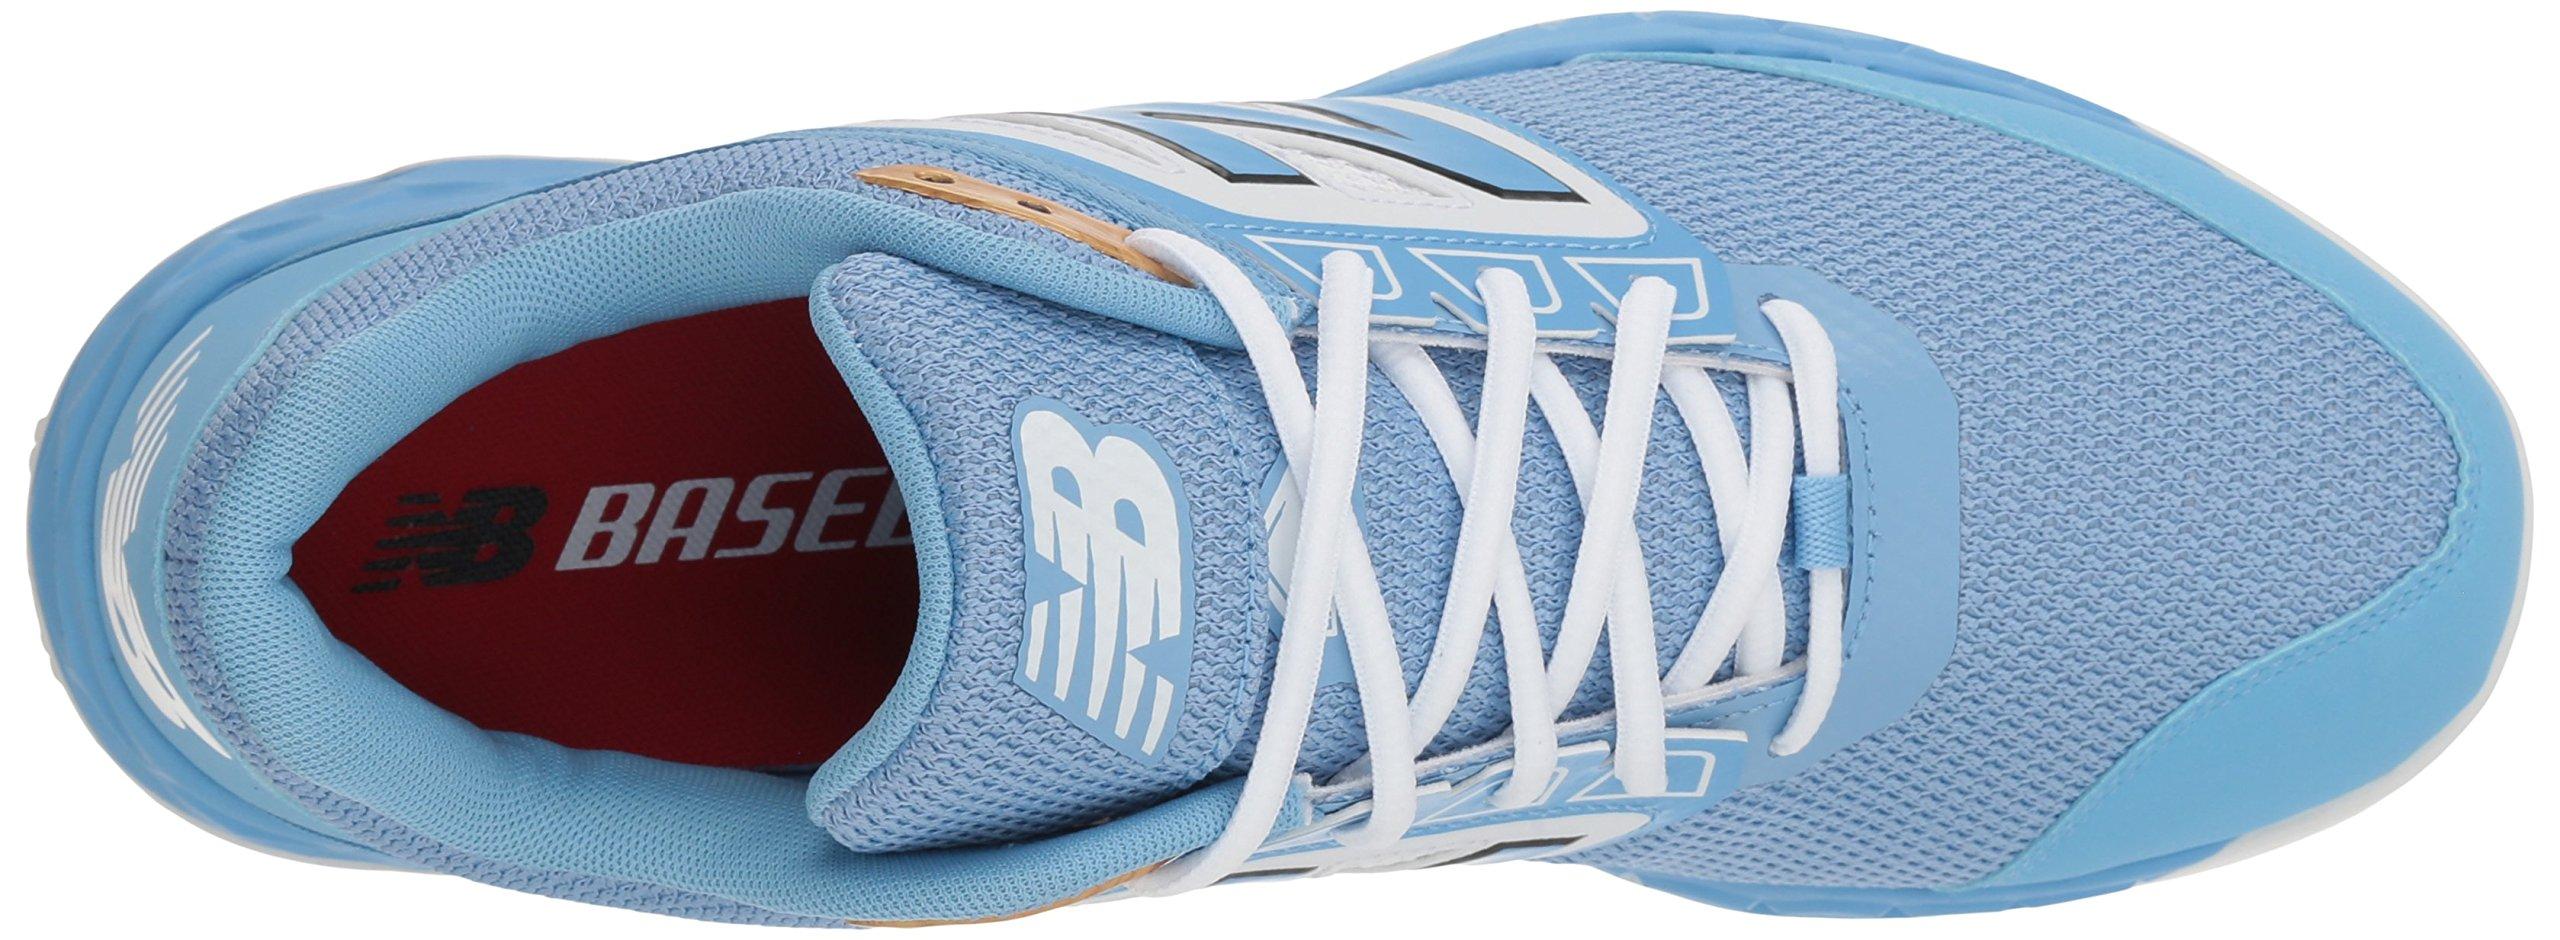 New Balance Men's 3000v4 Turf Baseball Shoe, Light Blue, 5 D US by New Balance (Image #7)